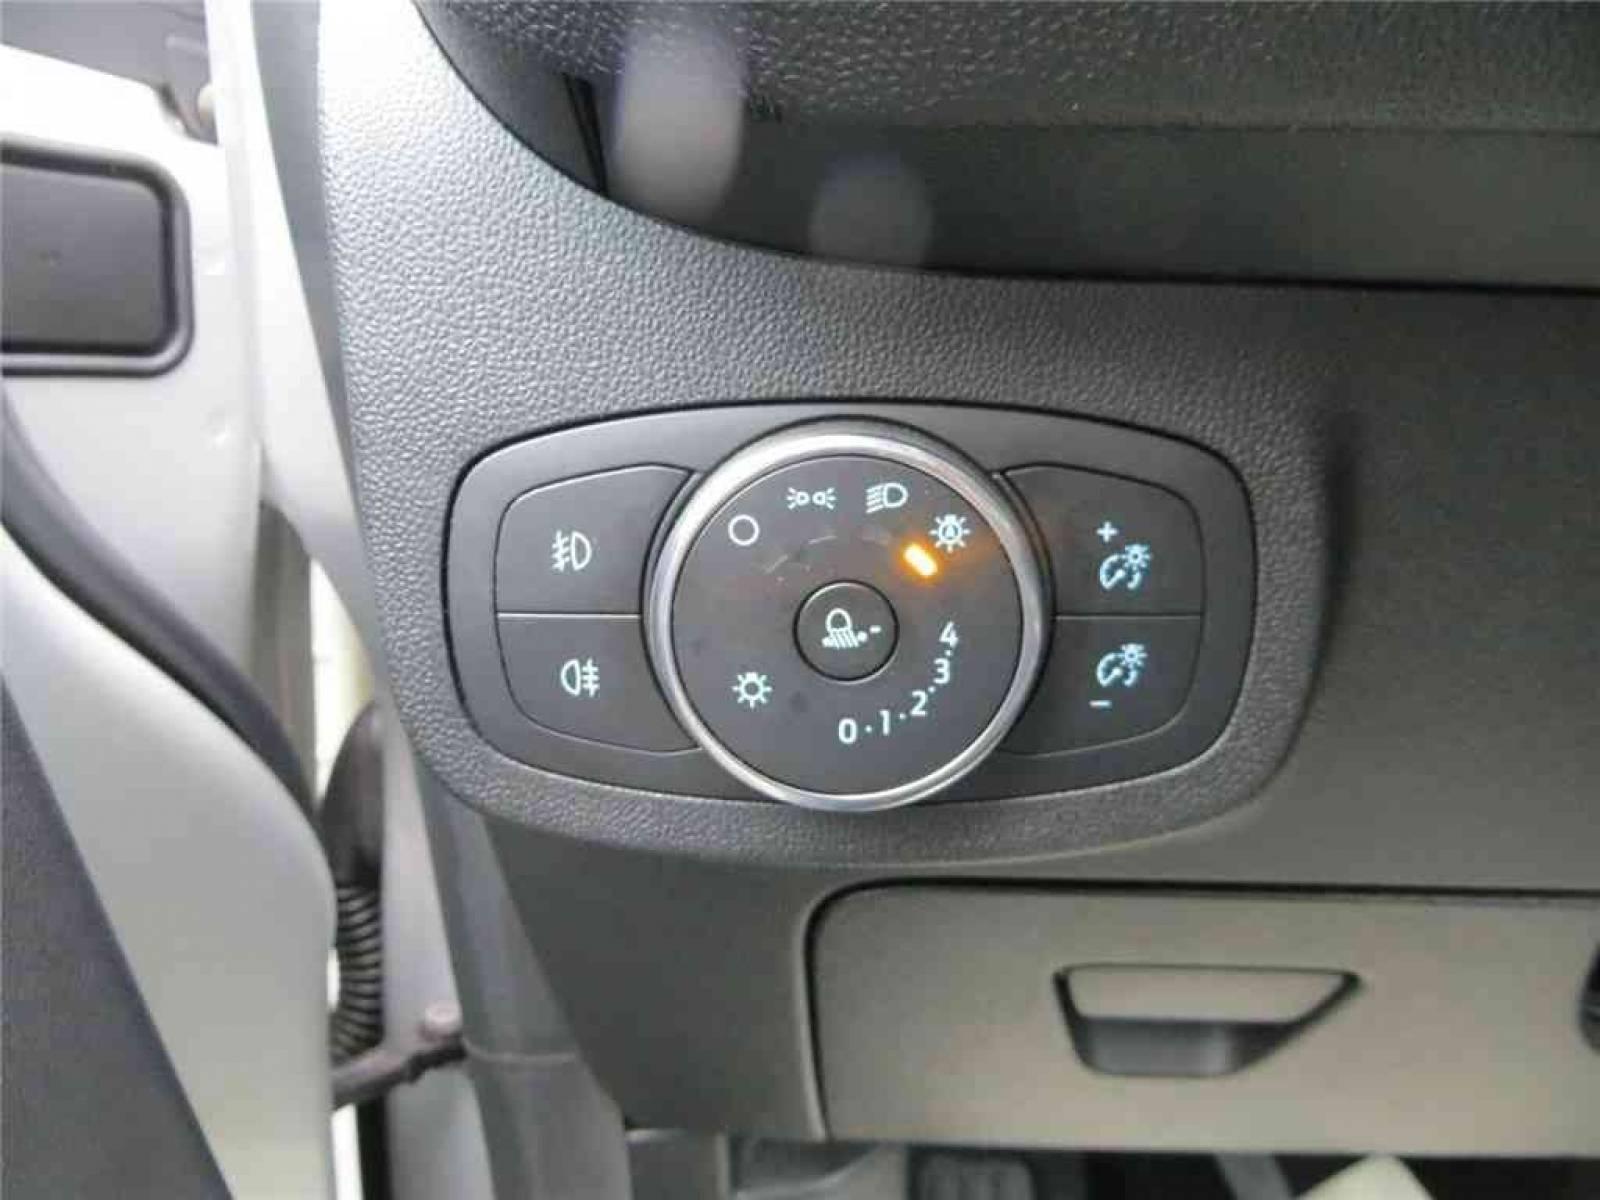 FORD Fiesta 1.0 EcoBoost 100 ch S&S BVM6 - véhicule d'occasion - Groupe Guillet - Opel Magicauto - Chalon-sur-Saône - 71380 - Saint-Marcel - 12